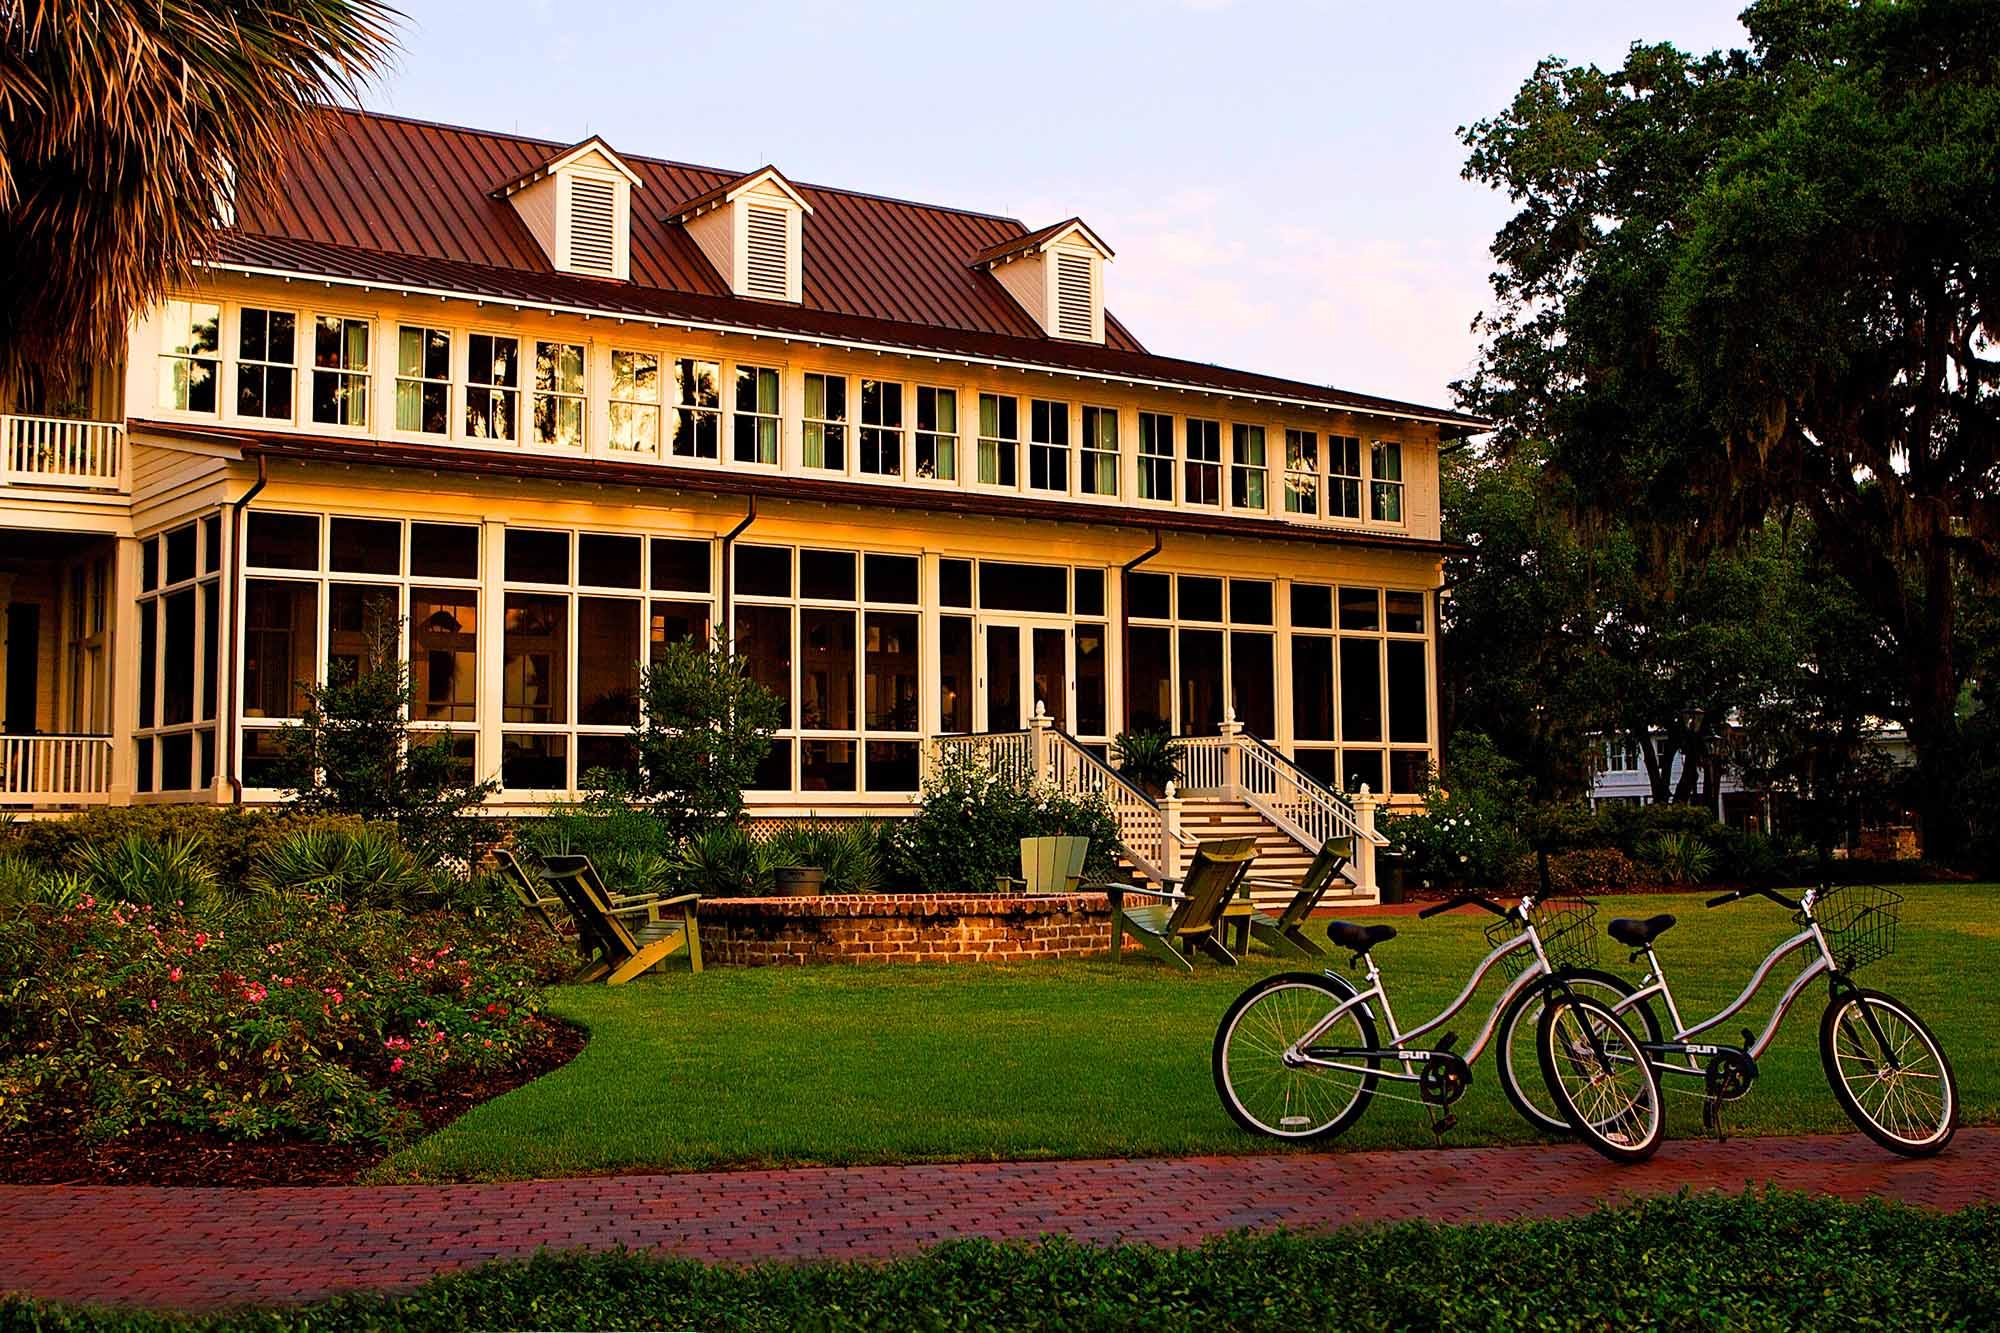 Motel Palmetto Bluff in South Carolina accommodations exterior